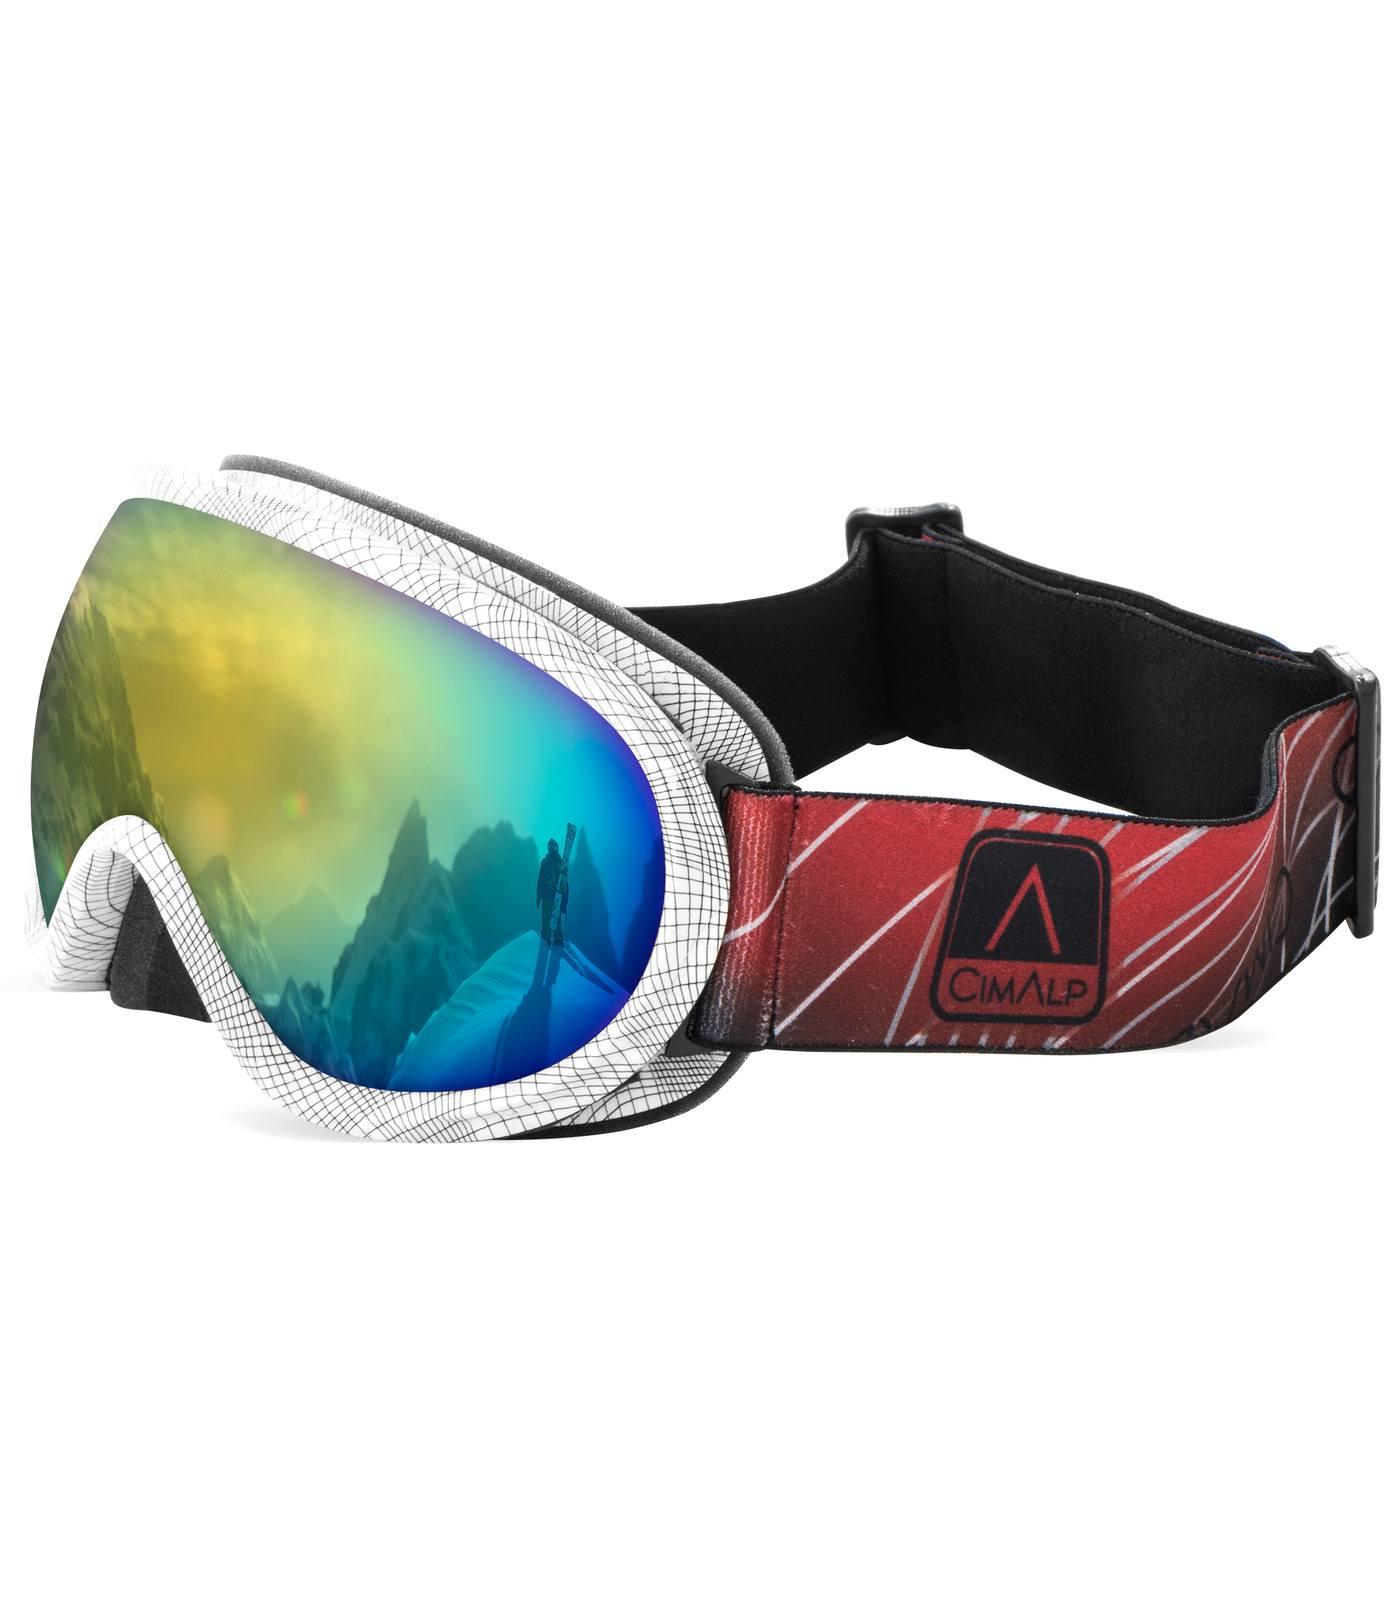 masque de ski forte luminosité